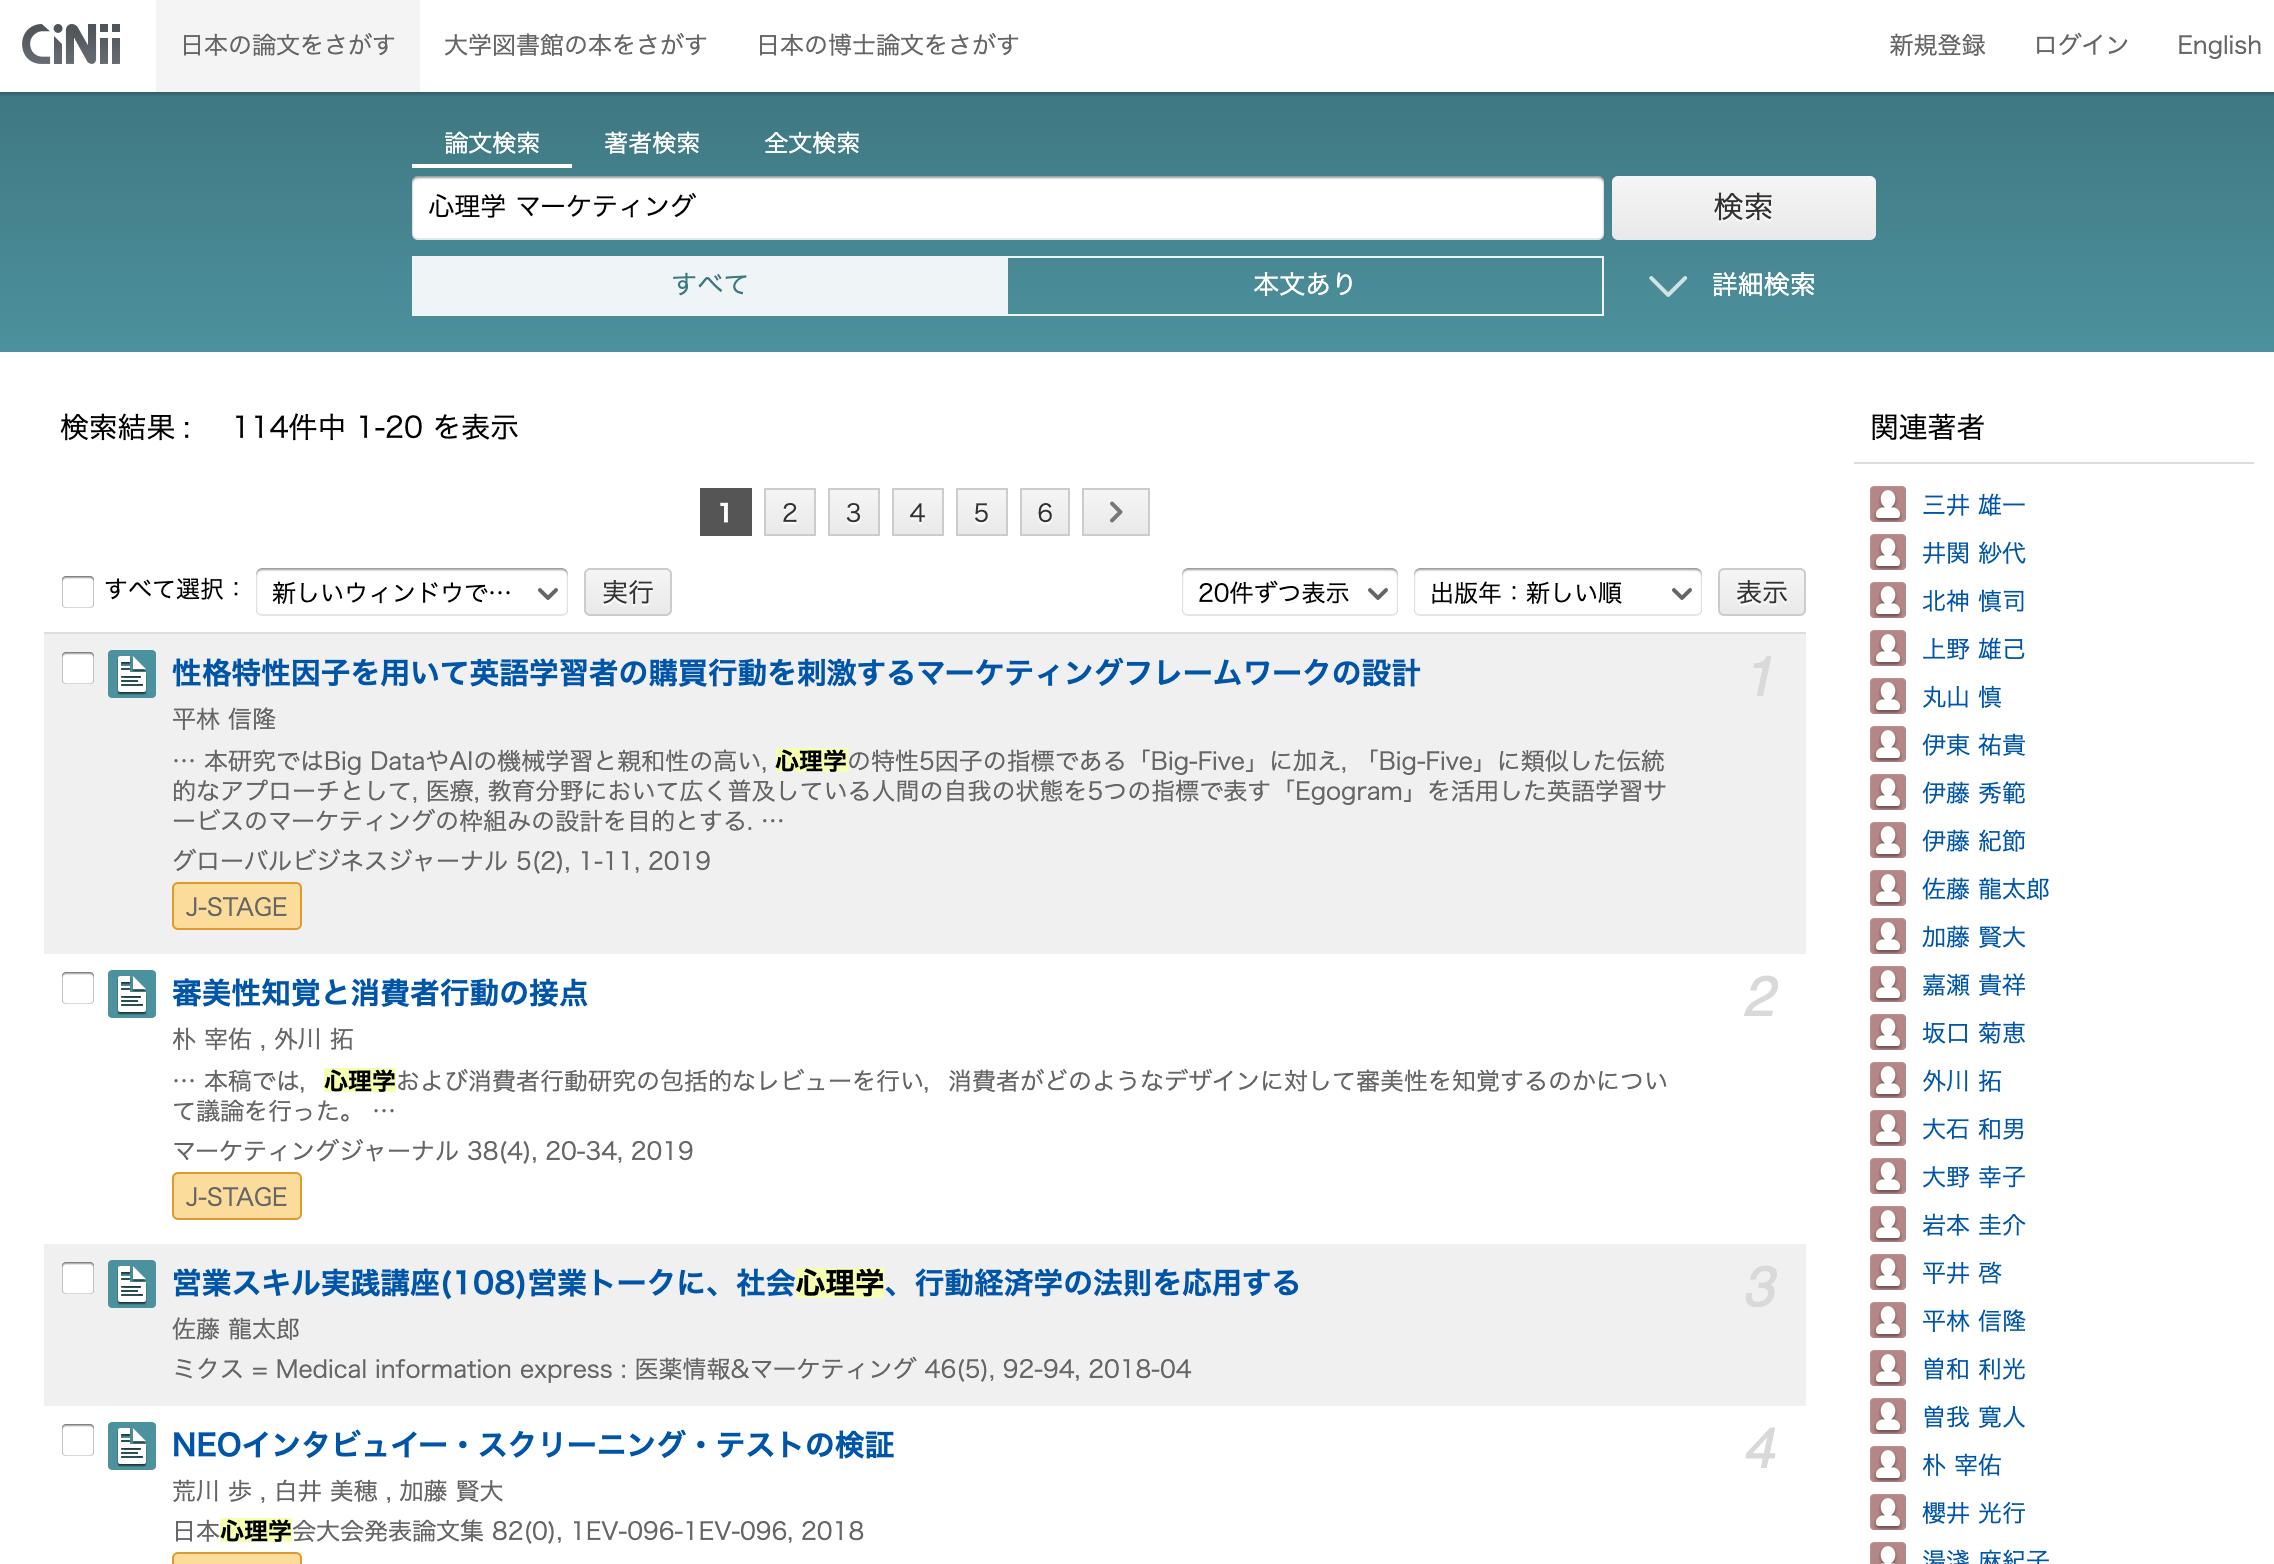 Cinii Articlesの検索結果